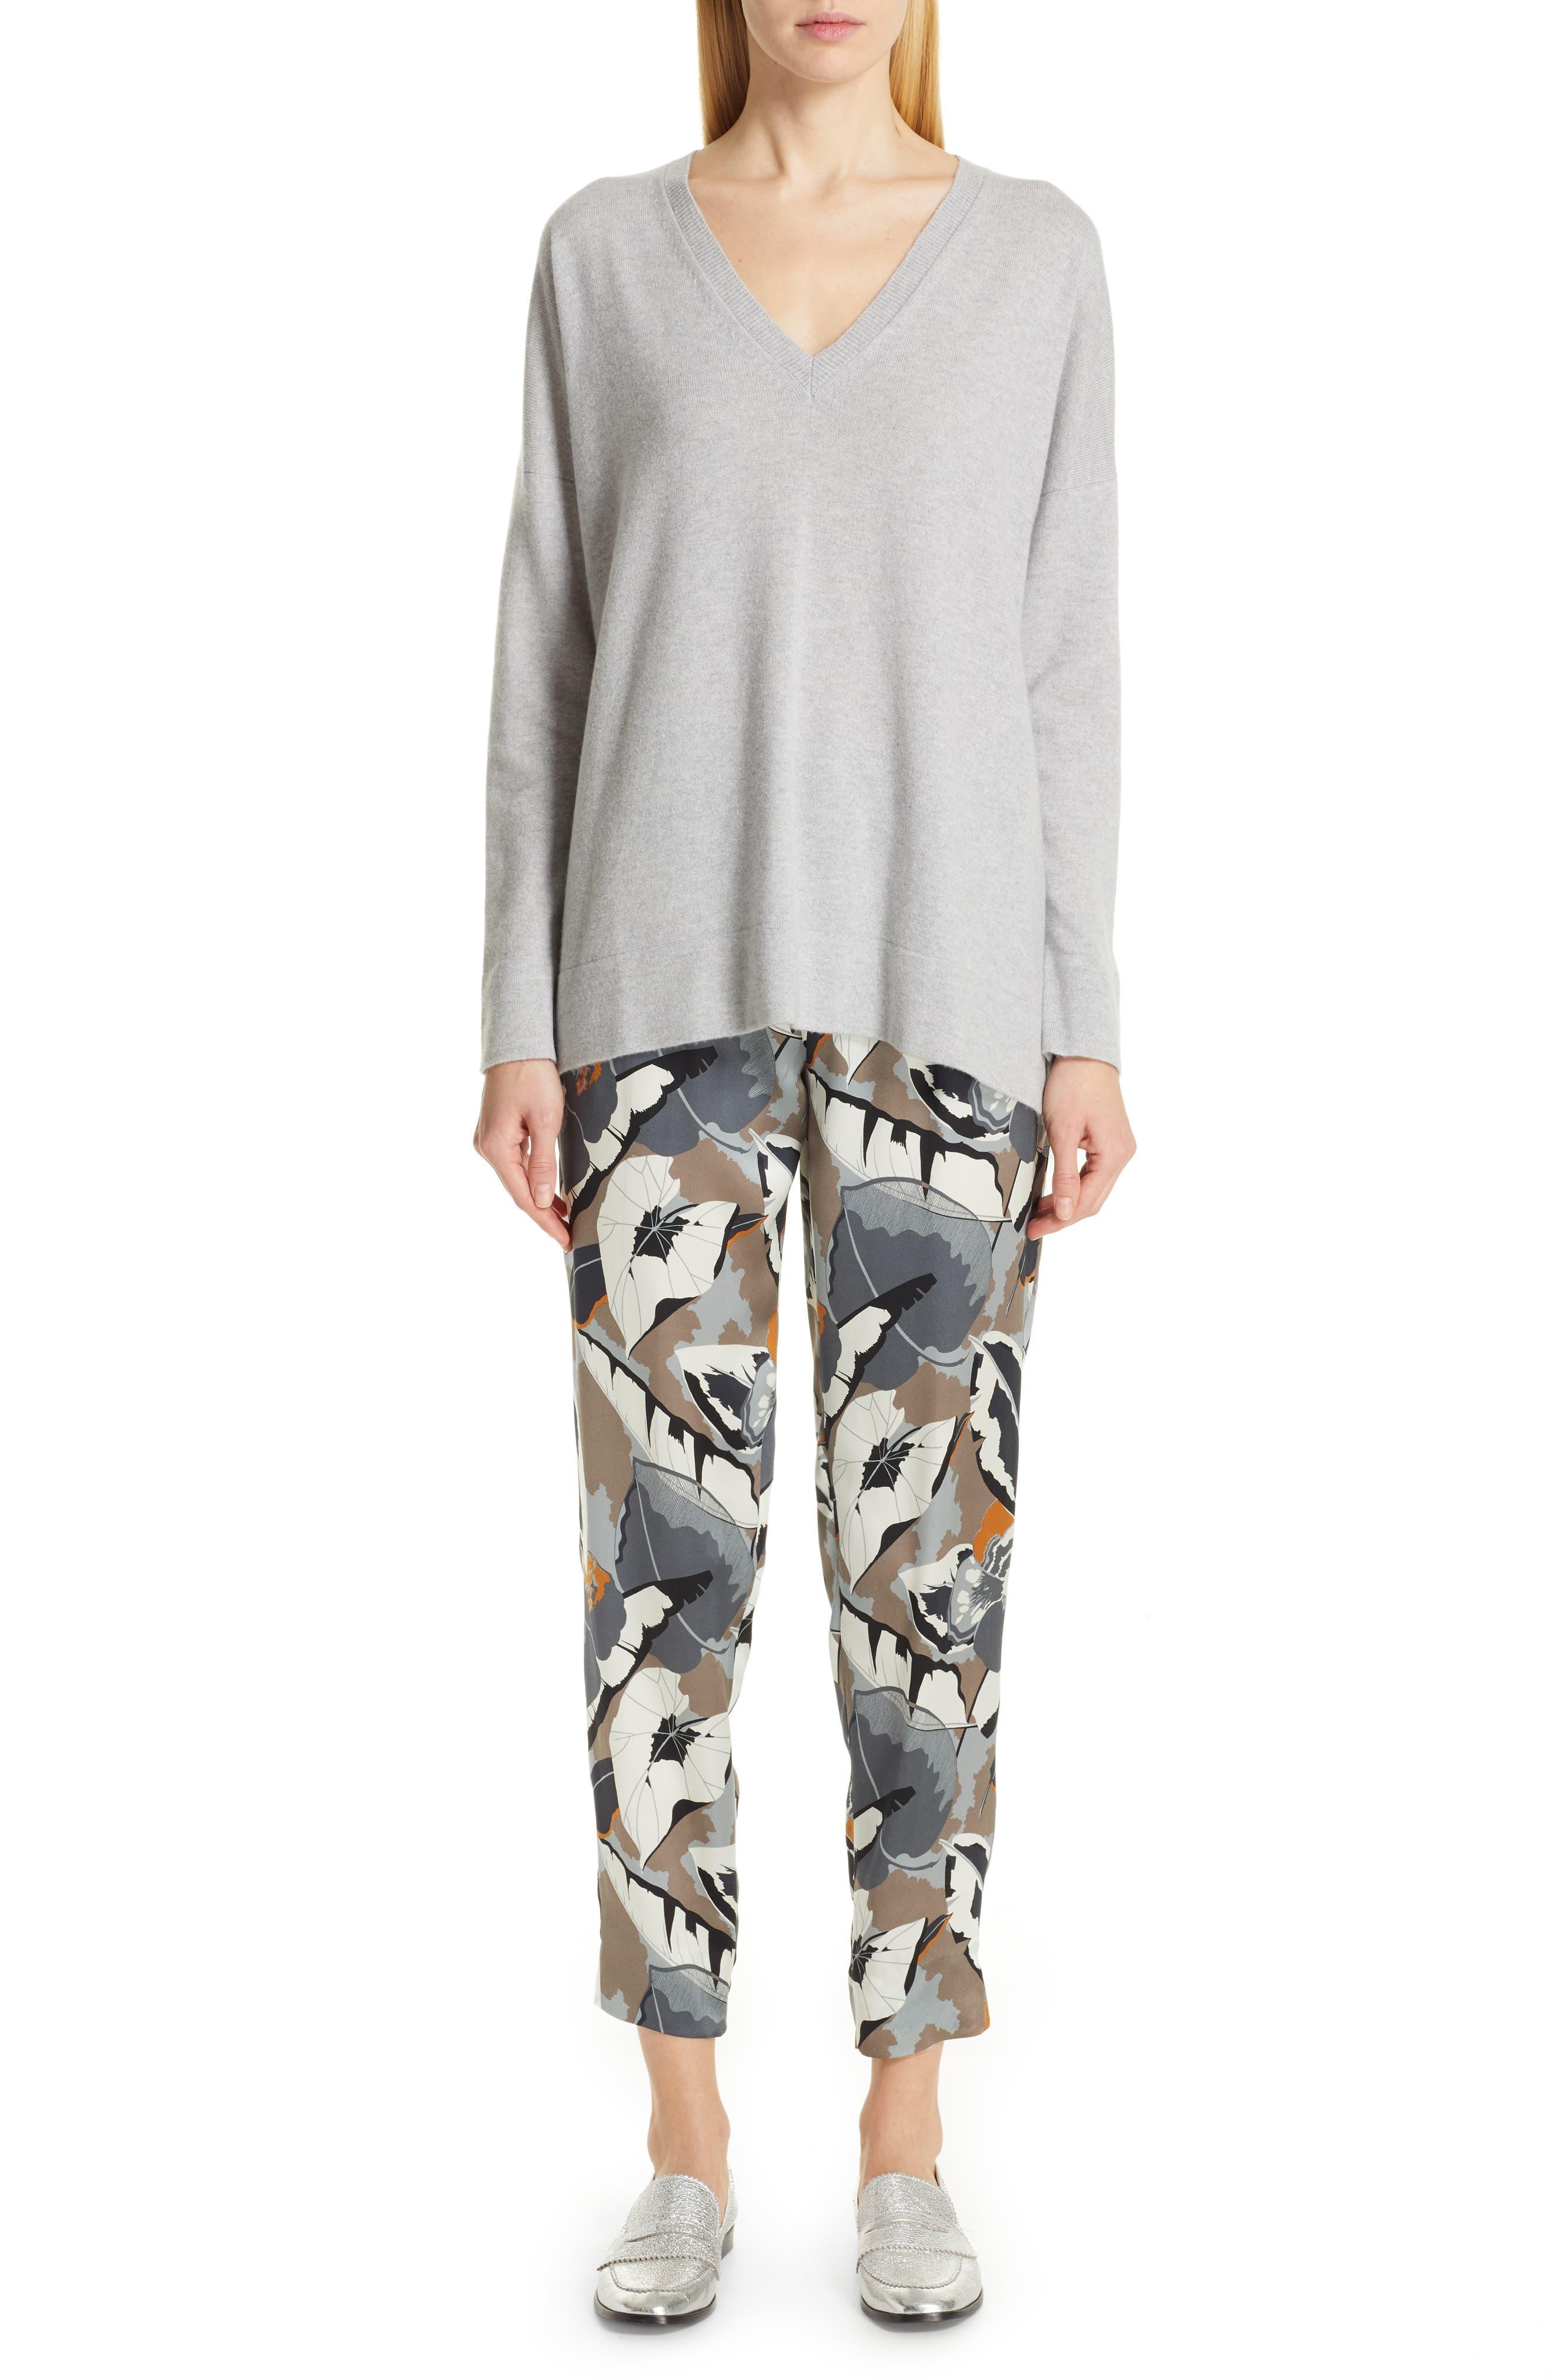 FABIANA FILIPPI,                             Tulle Inset Cashmere Sweater,                             Alternate thumbnail 8, color,                             GREY